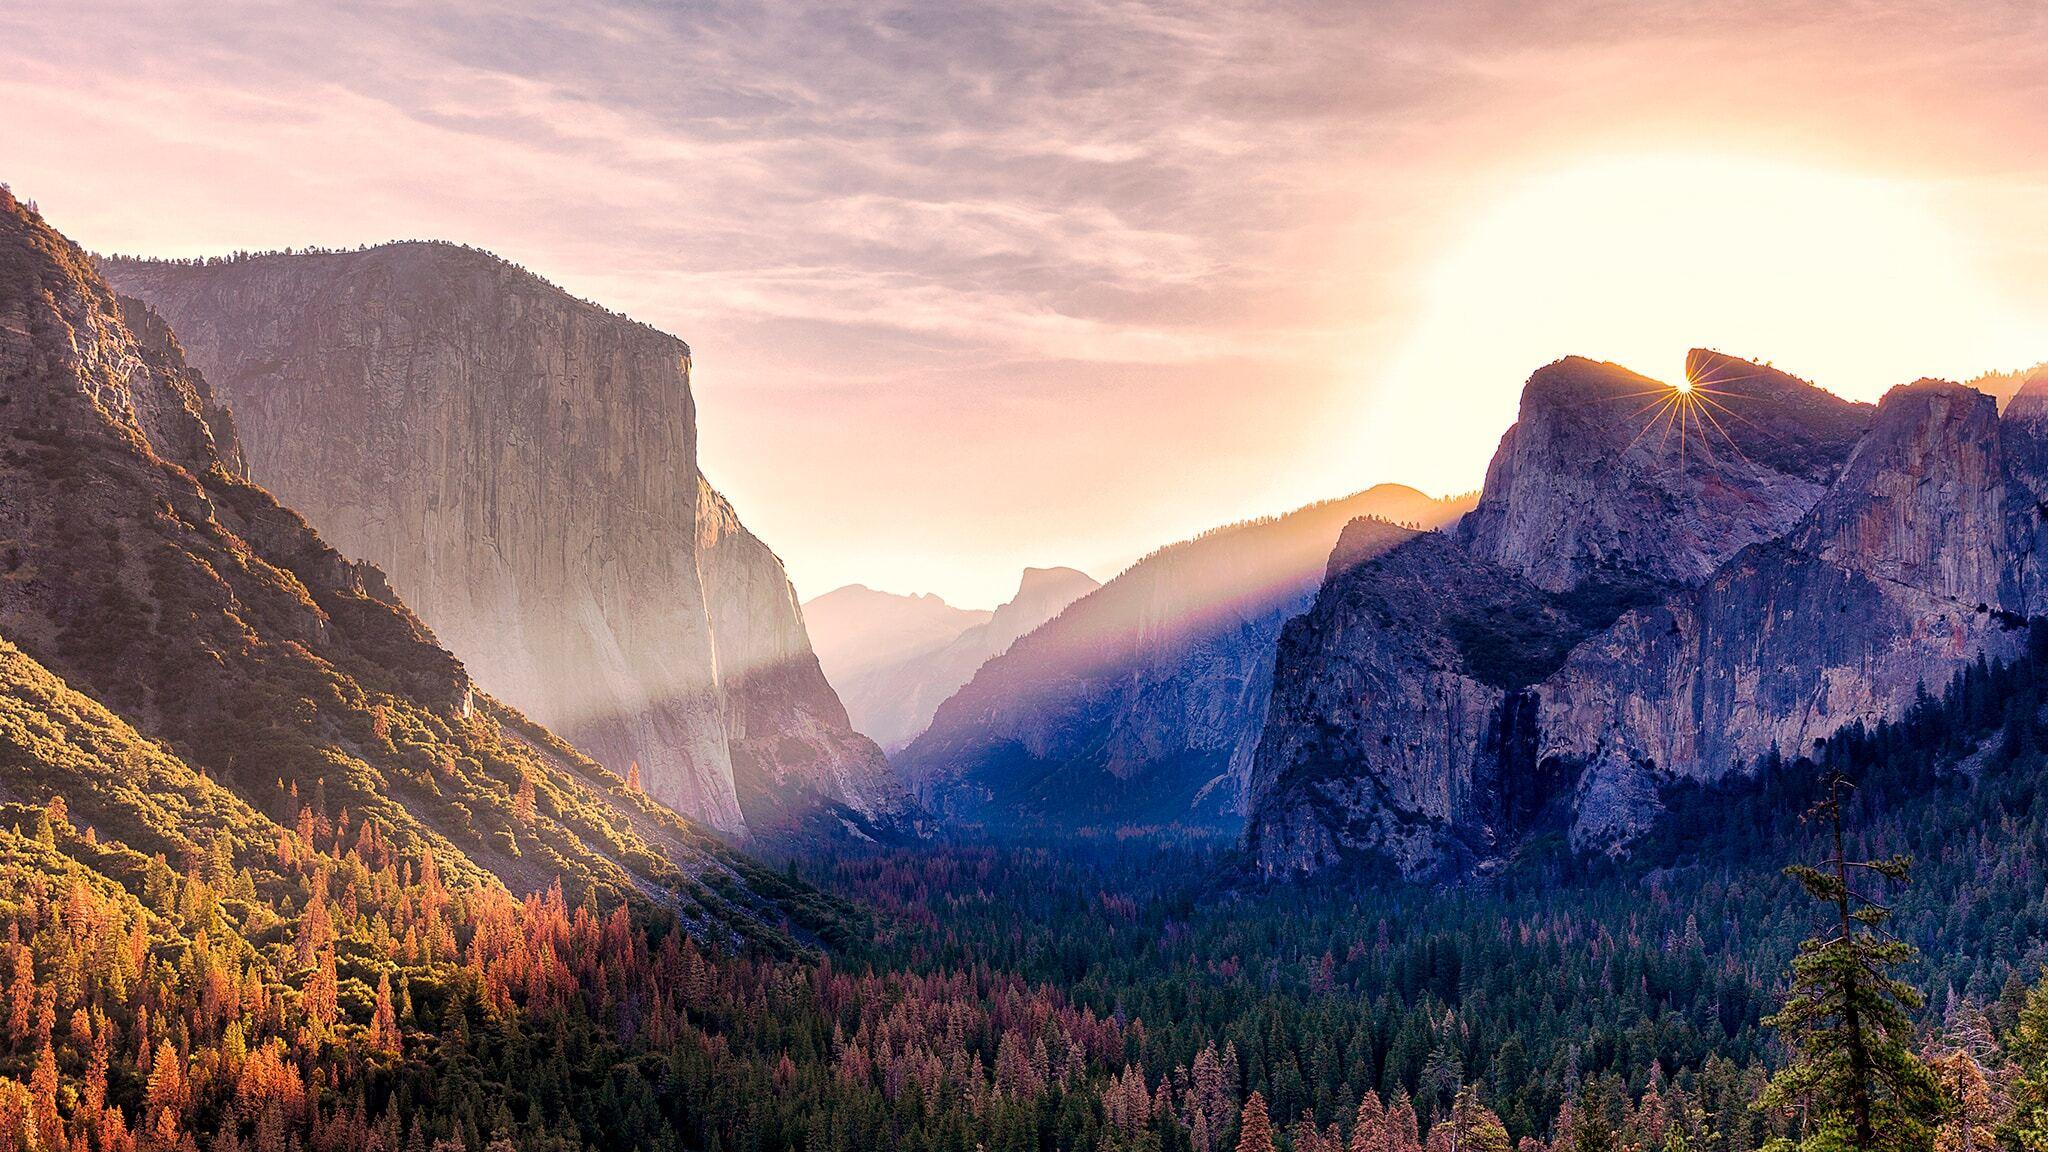 2048x1152 Yosemite Valley Morning